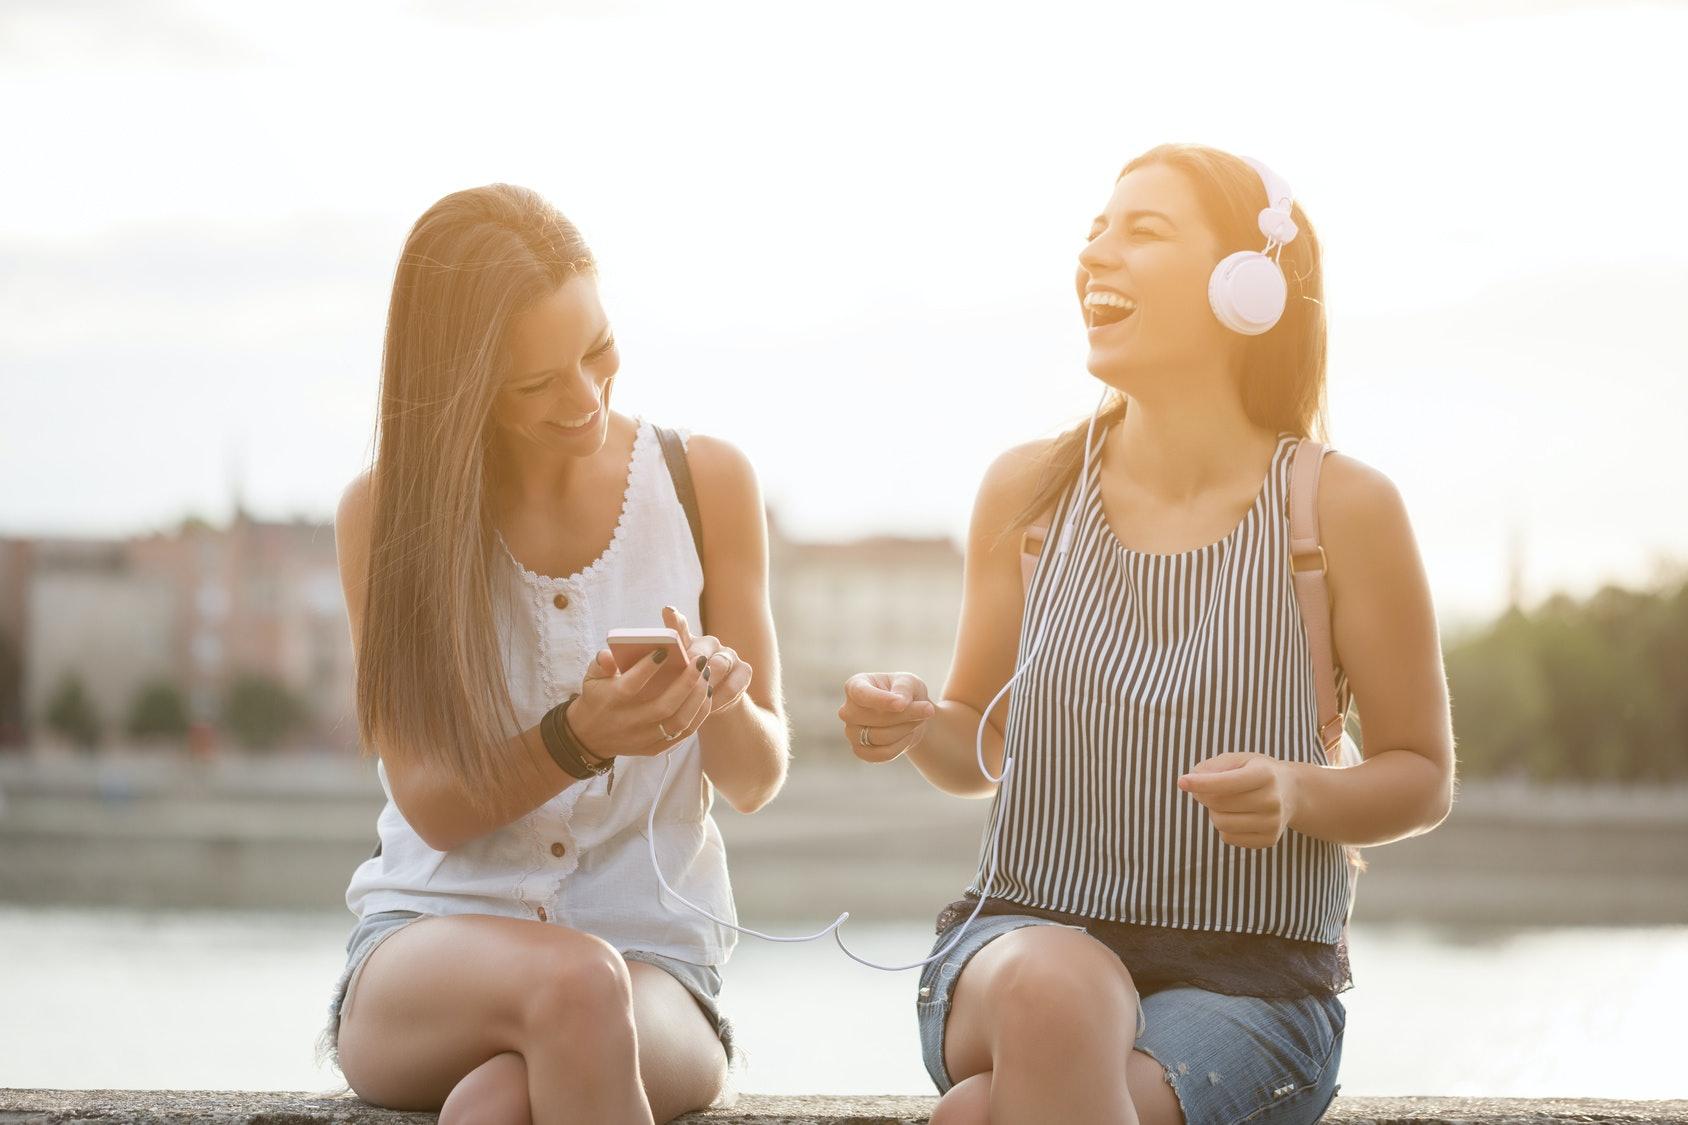 Introvert dating extrovert reddit